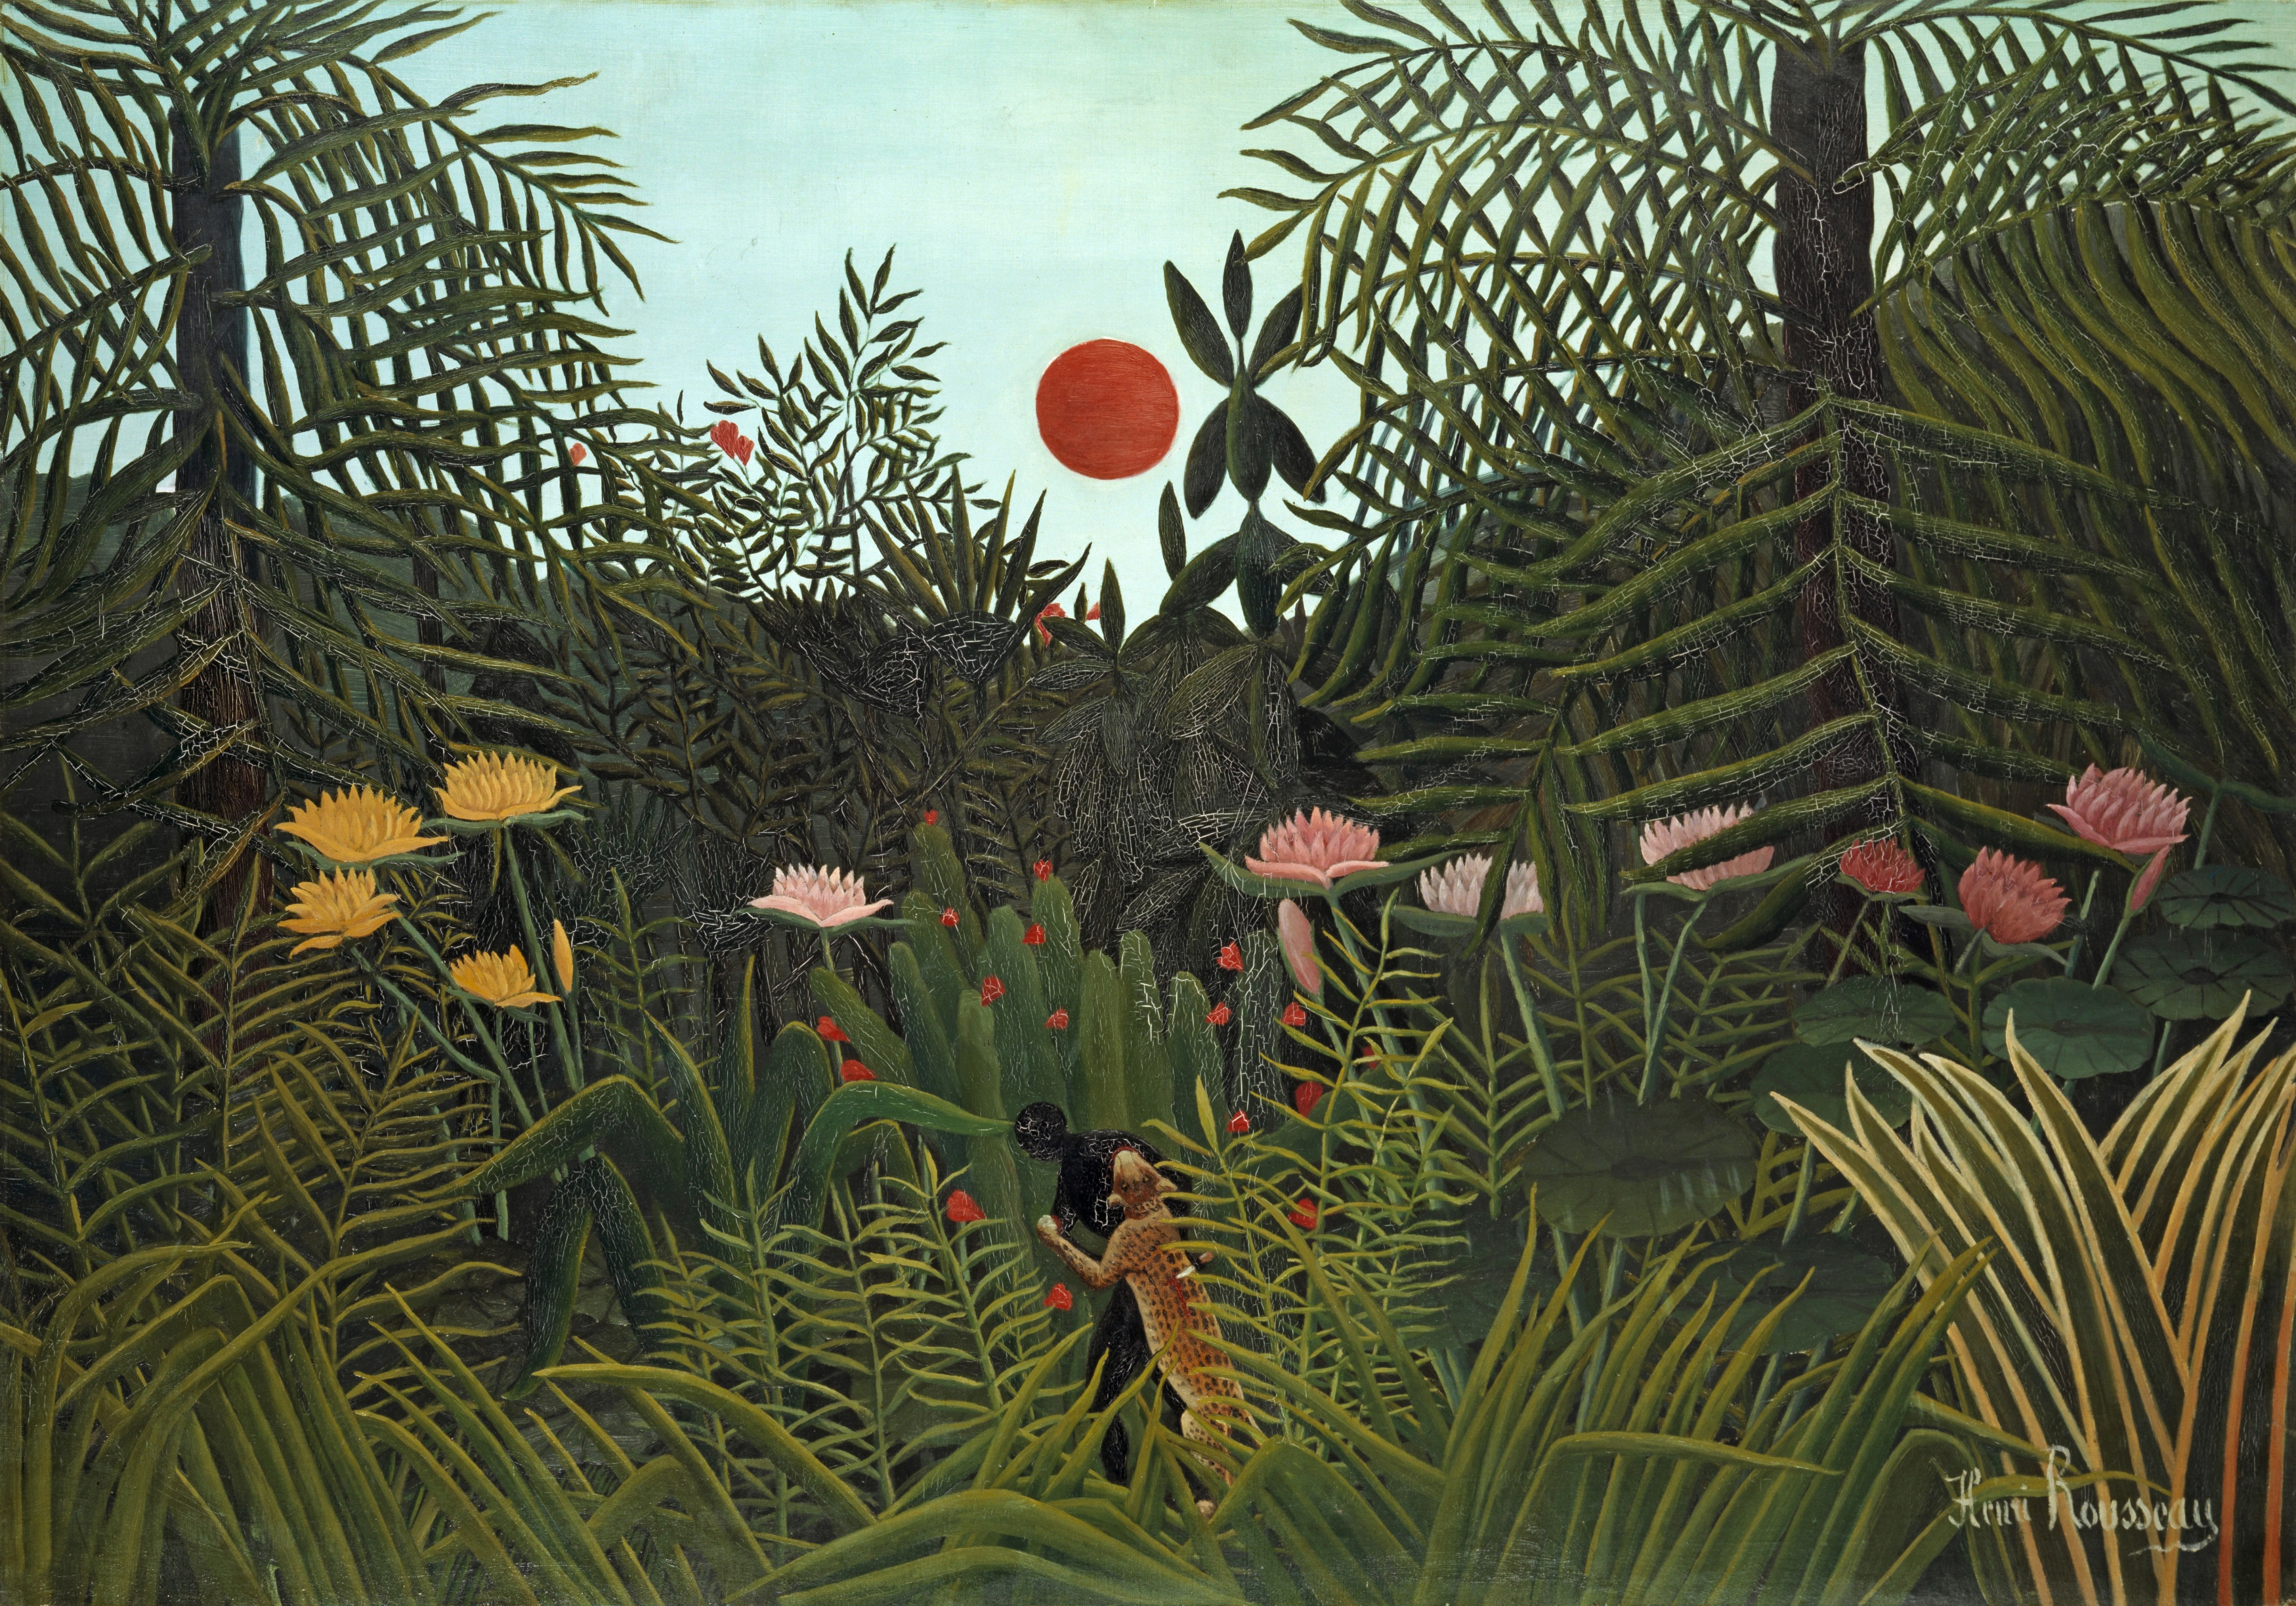 Henri Rousseau (Le Douanier), Jungle with Setting Sun, 1910. Kunstmuseum Basel